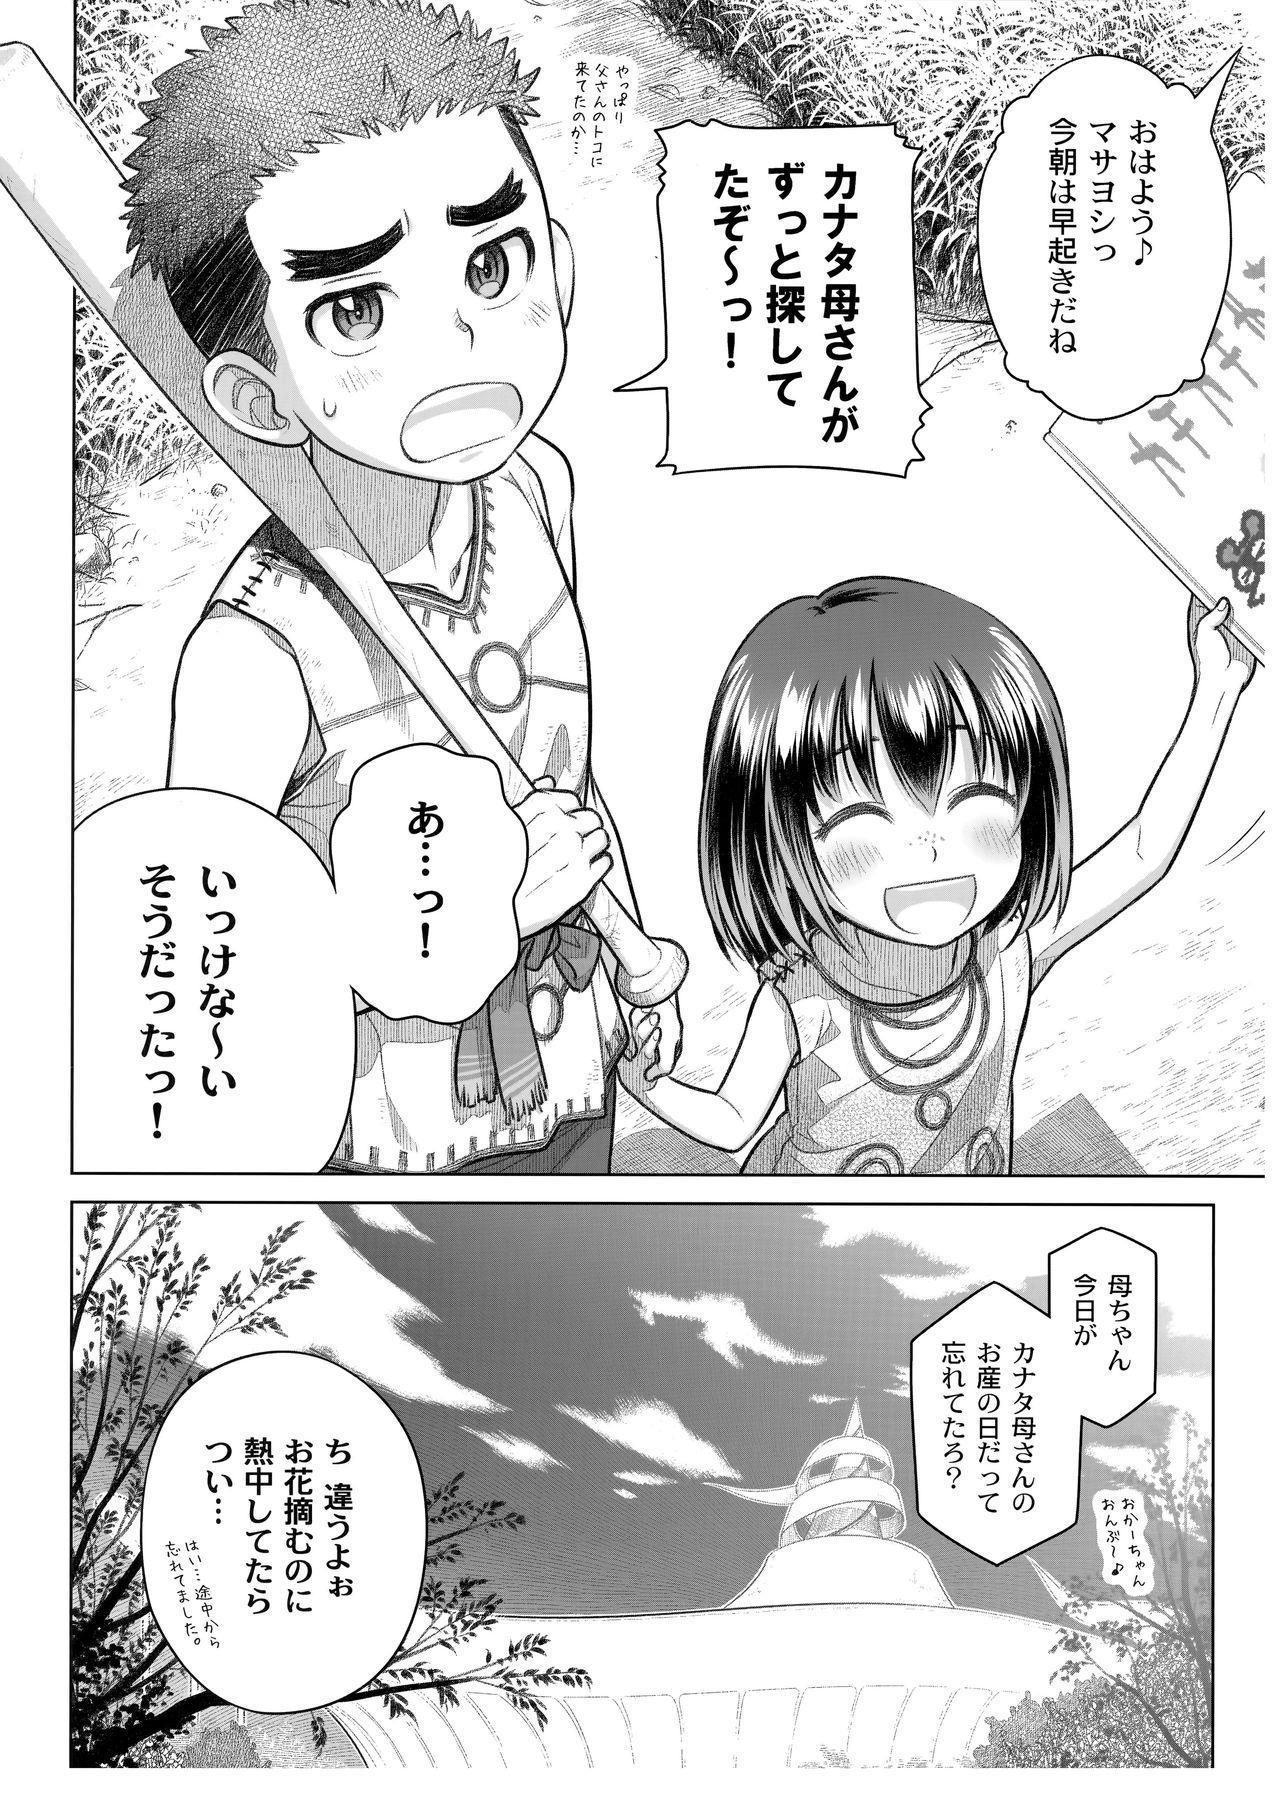 Sorako no Tabi 8 43